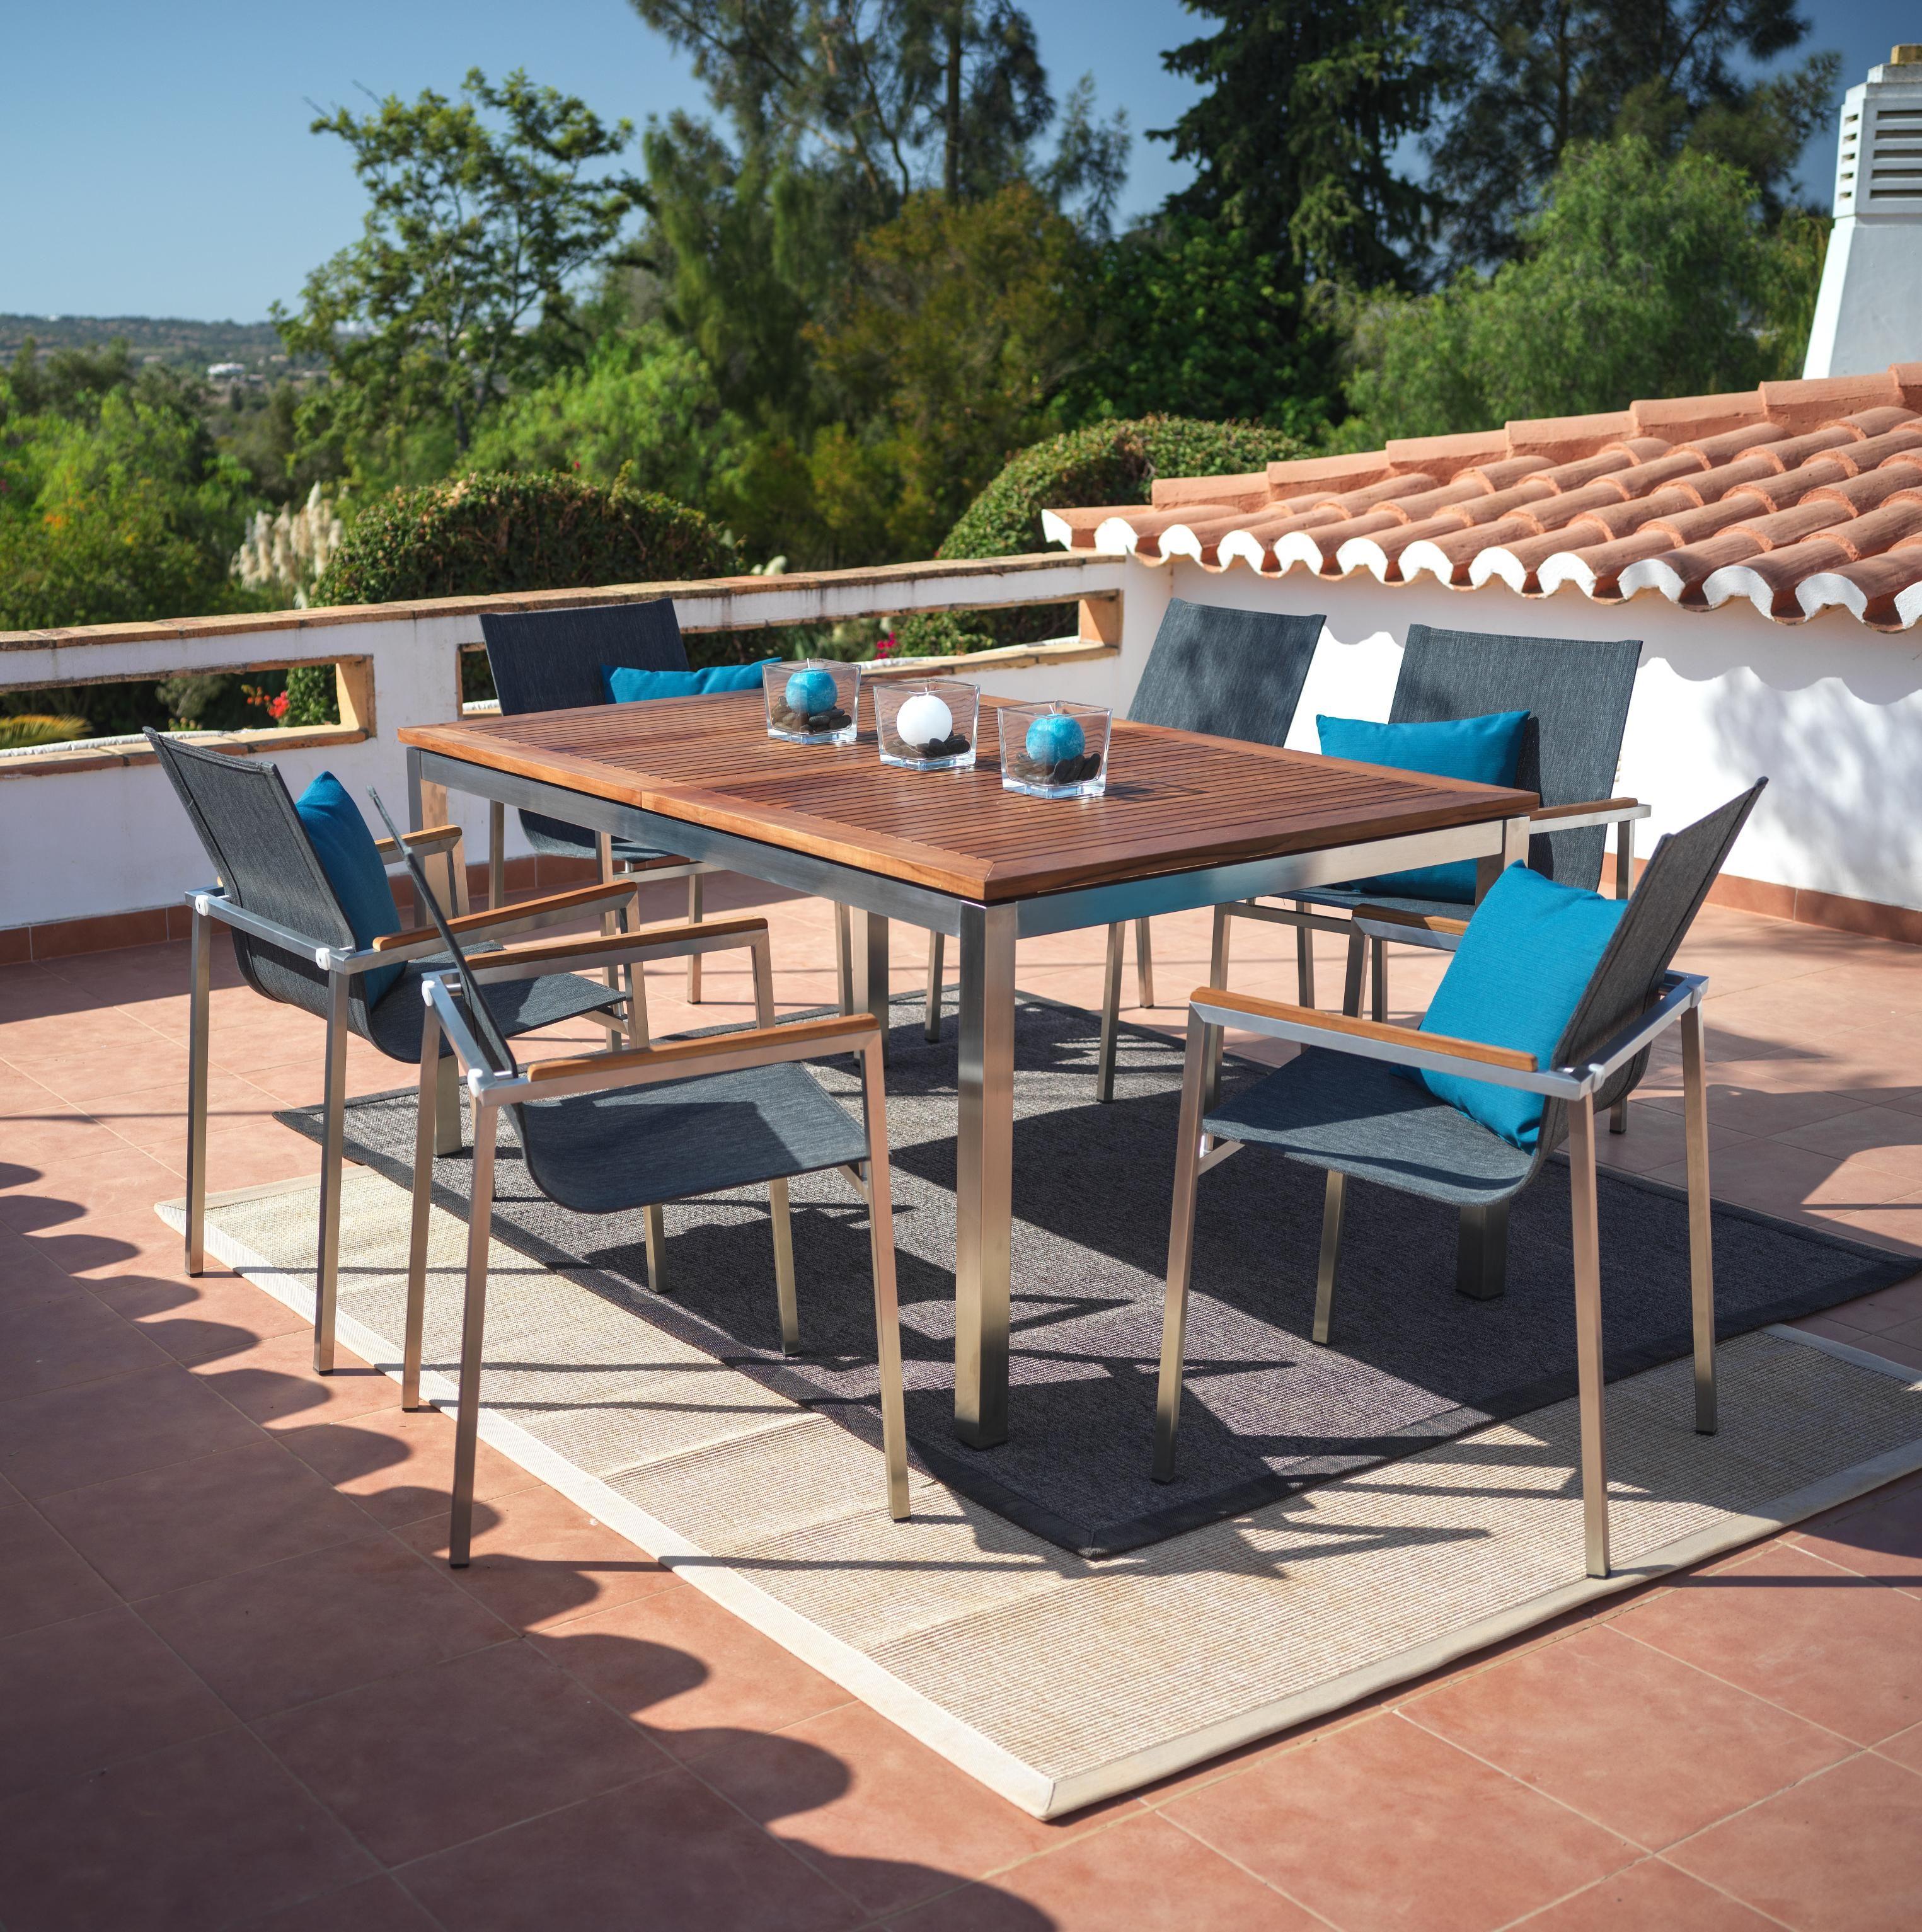 Moderne Sitzgruppe Aus Metall Und Holz Elegante Gartenmobel Gartenmobel Mobel Balkonmobel